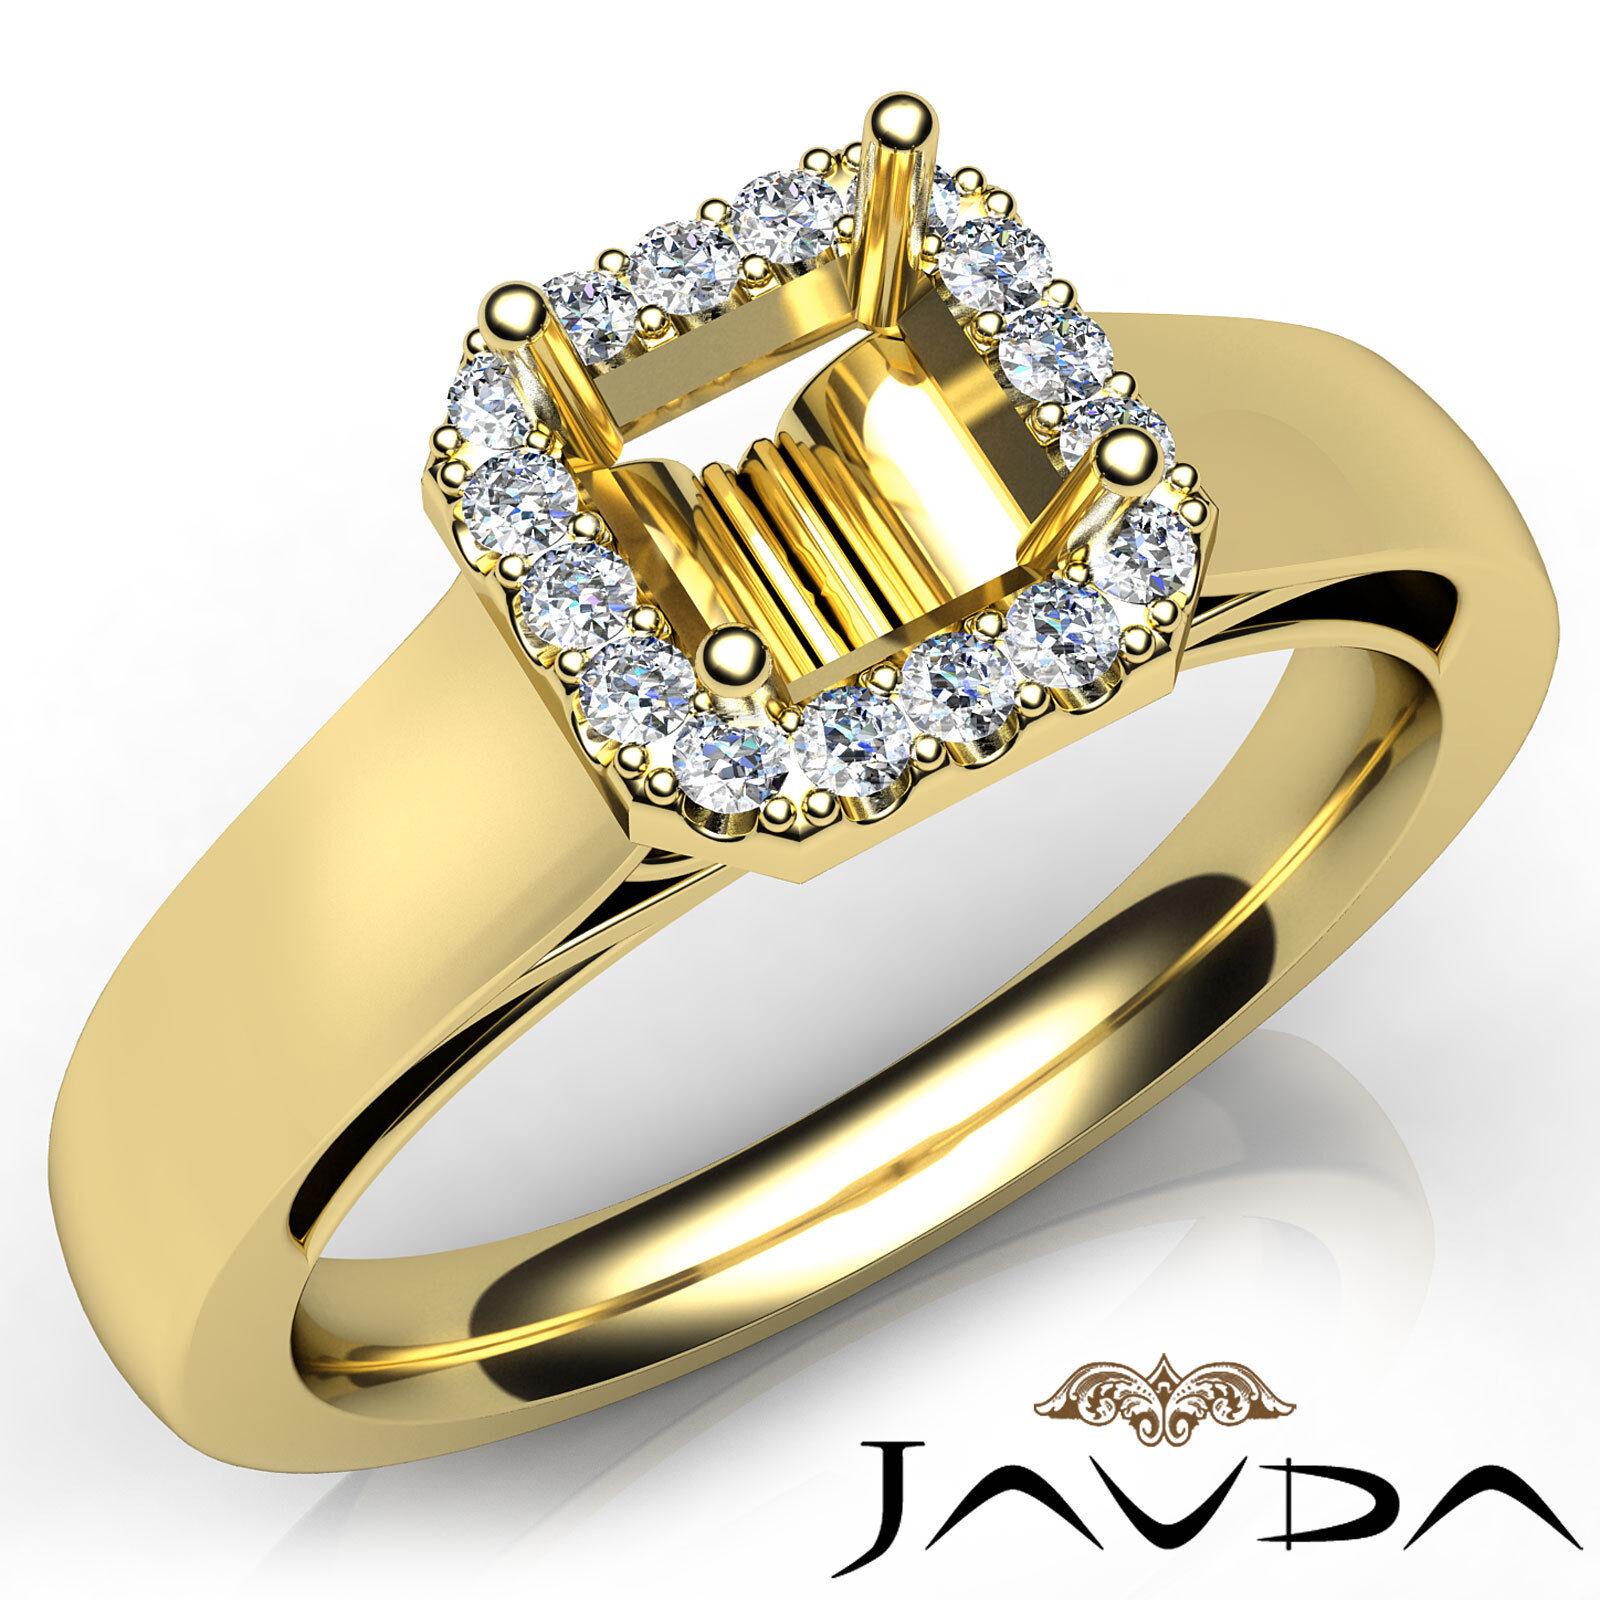 Halo Setting Asscher Diamond Engagement 14k Yellow gold Semi Mount Ring 0.2Ct